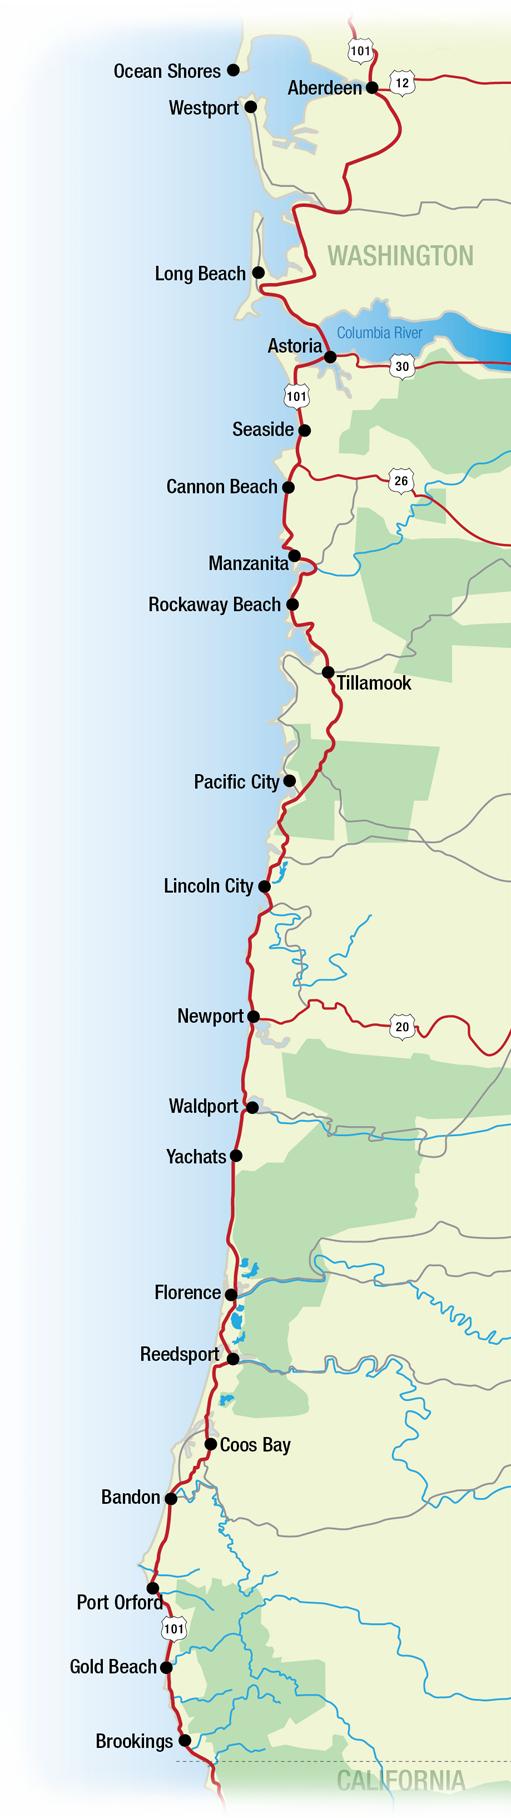 Oregon California Coast Map - Klipy - Oregon California Coast Map